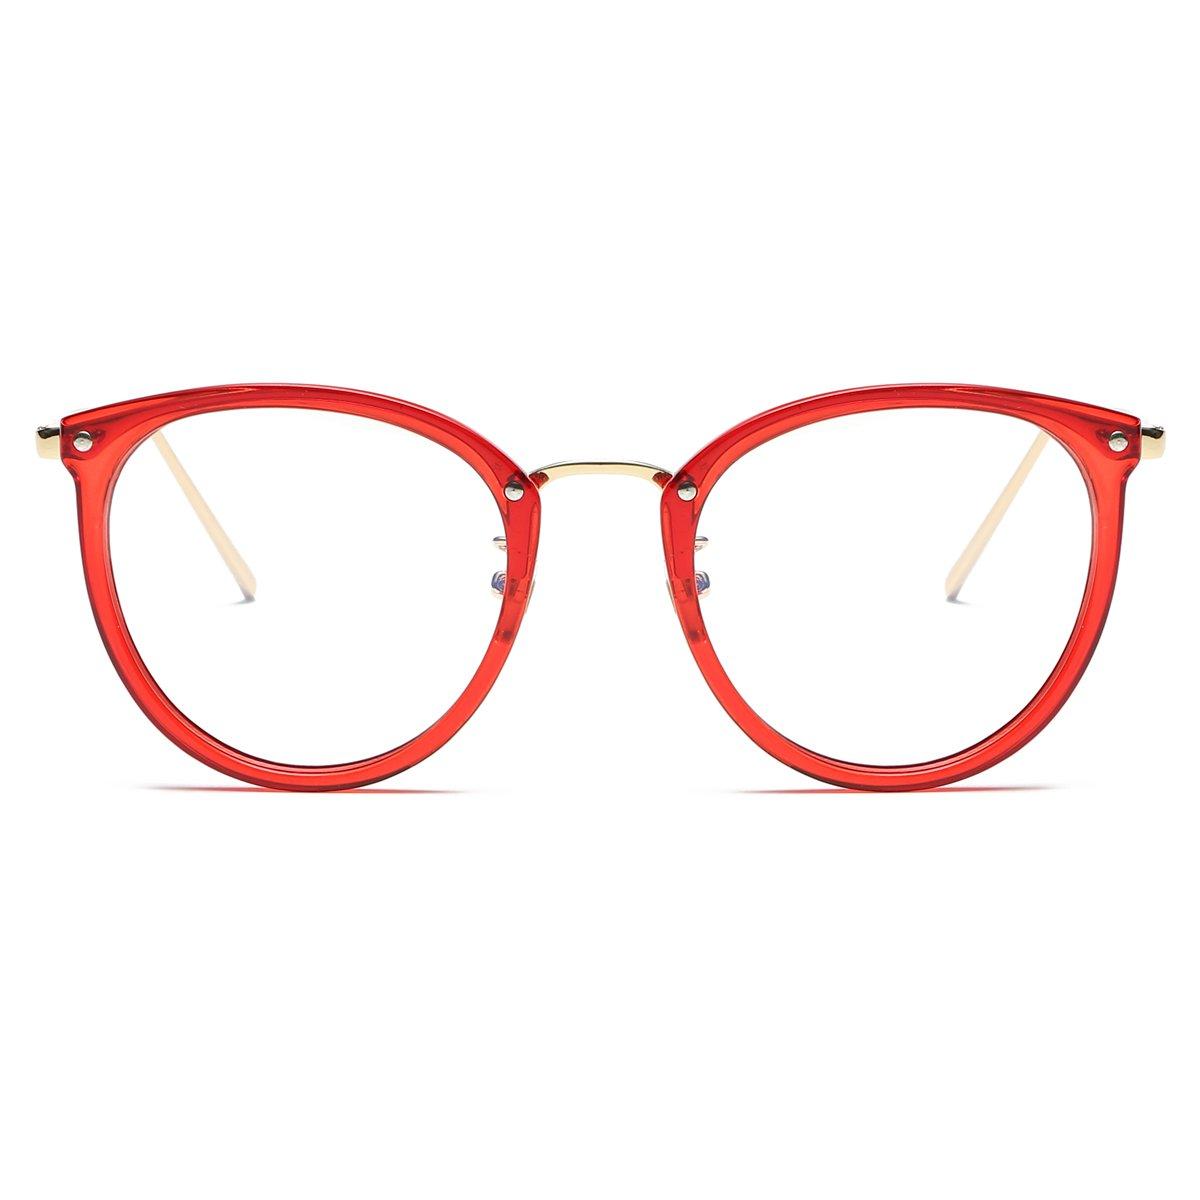 7de58e41029 Amazon.com  Amomoma Womens Fashion Clear Lens Round Frame Eye Glasses  AM5001 Red Frame Clear Lens  Clothing